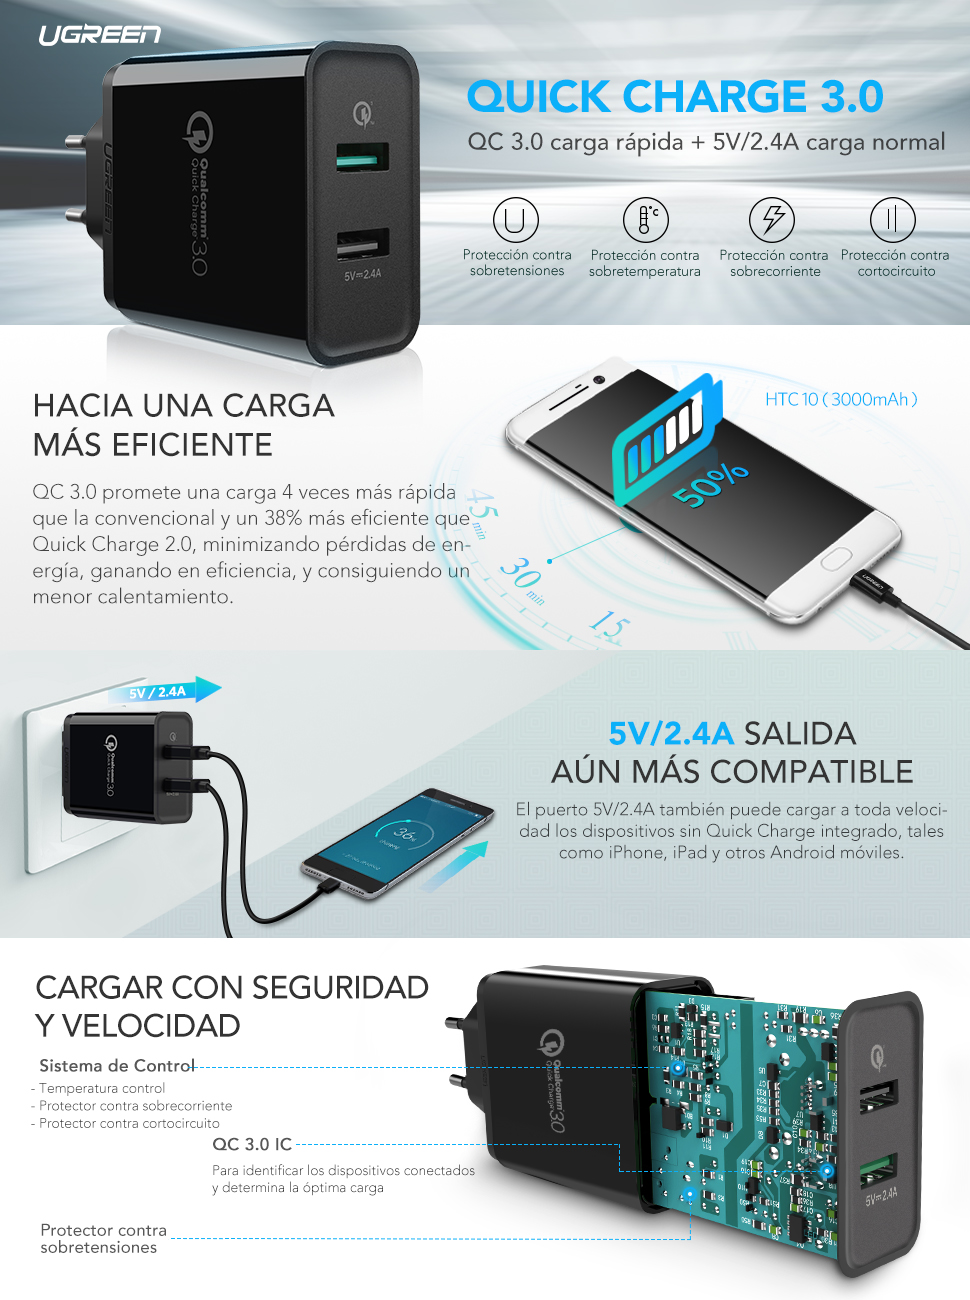 UGREEN Cargador de Red, Cargador Rápido 2 Puertos USB QC 3.0 y 5V/2.4A, 30W Cargador Quick Charge 3.0 para Samsung S10 S9 S8 S7, Xiaomi Mi A2 Mi A1 ...